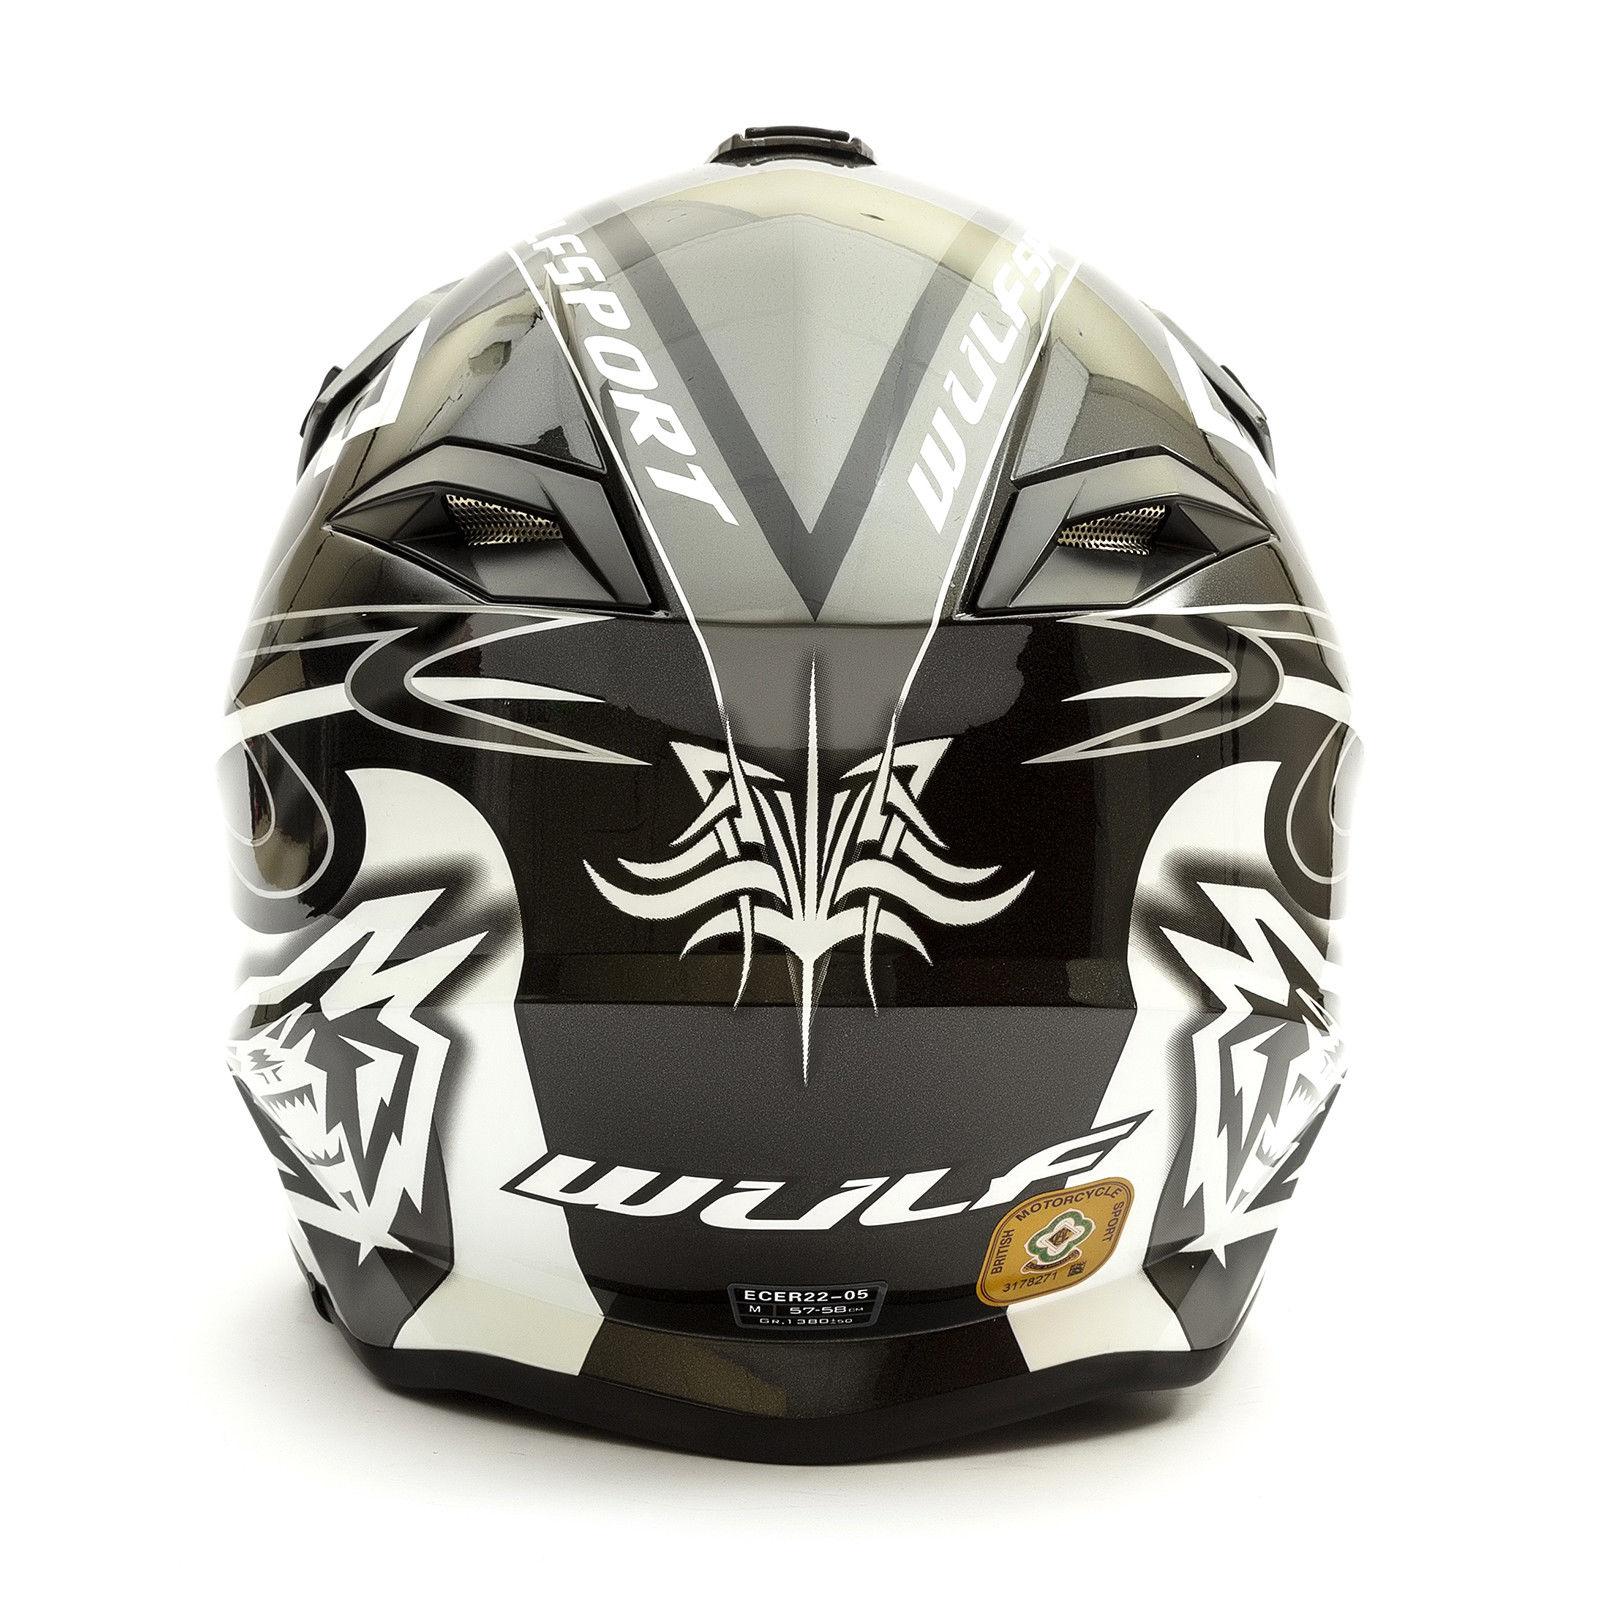 Wulfsport-Adult-Sceptre-Helmets-Motocross-Pitbike-Motorbike-Off-Road-Racing-ATV thumbnail 12